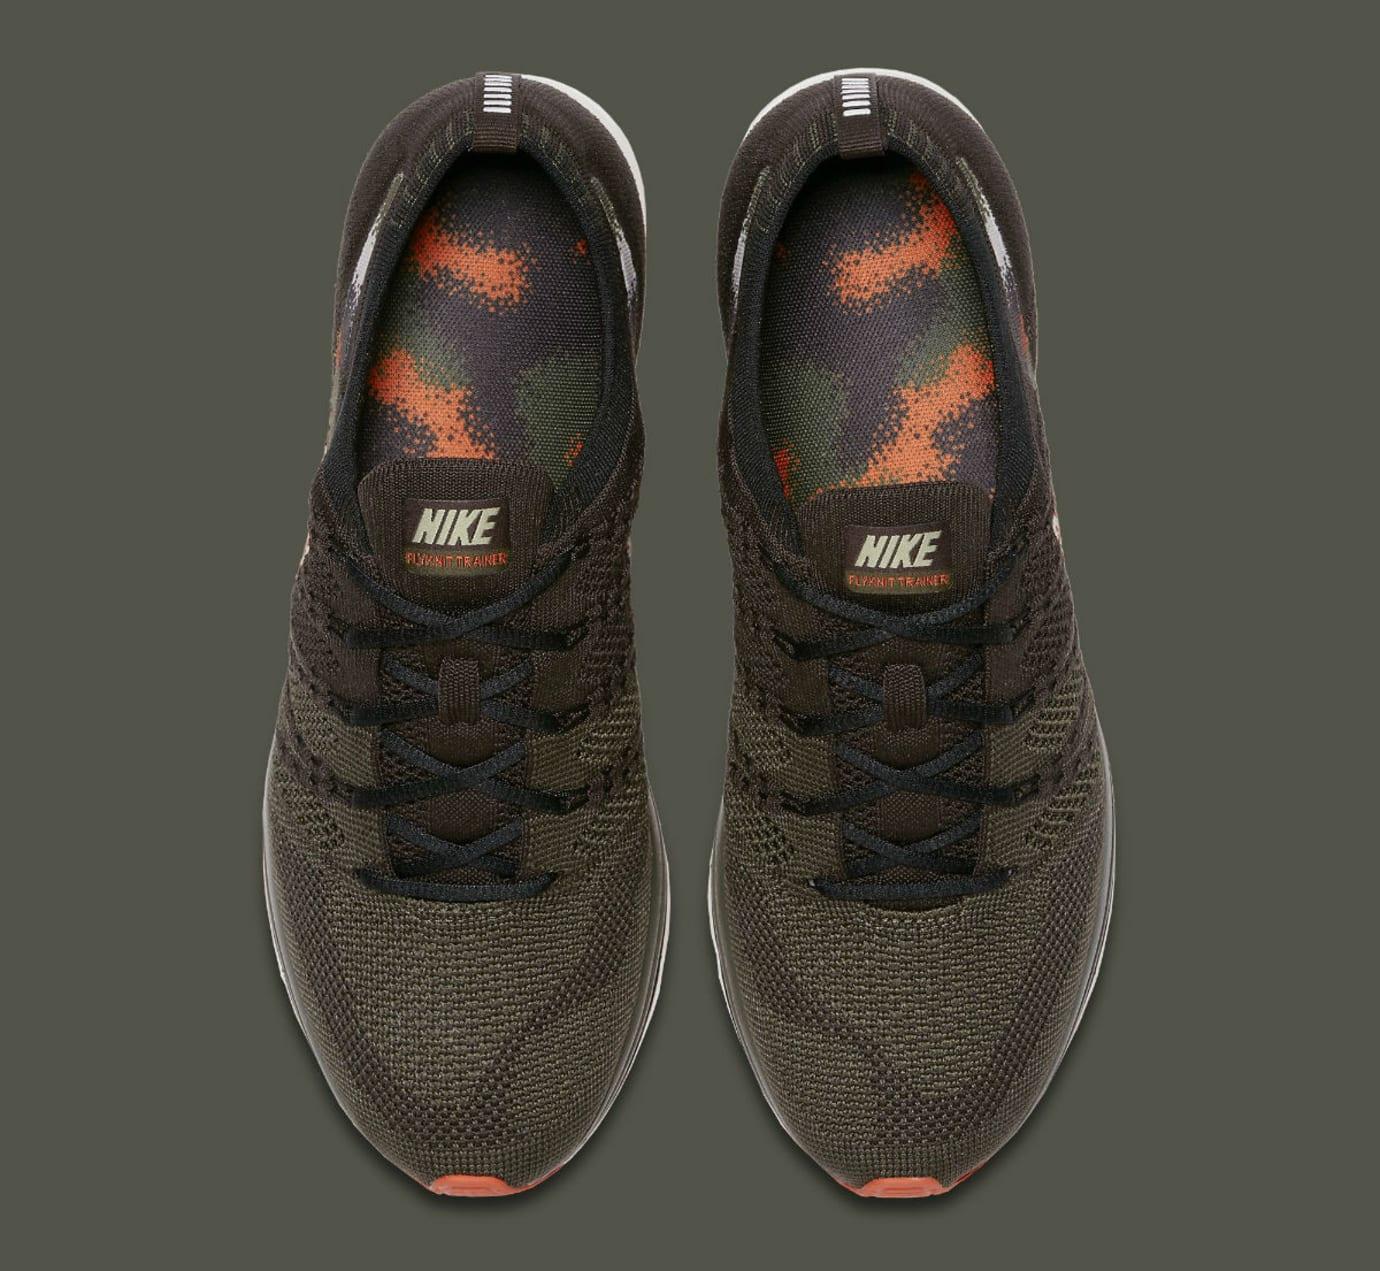 cc32d6b6cf59 Image via Nike Nike Flyknit Trainer Dark Green Release Date AH8396-202 Top